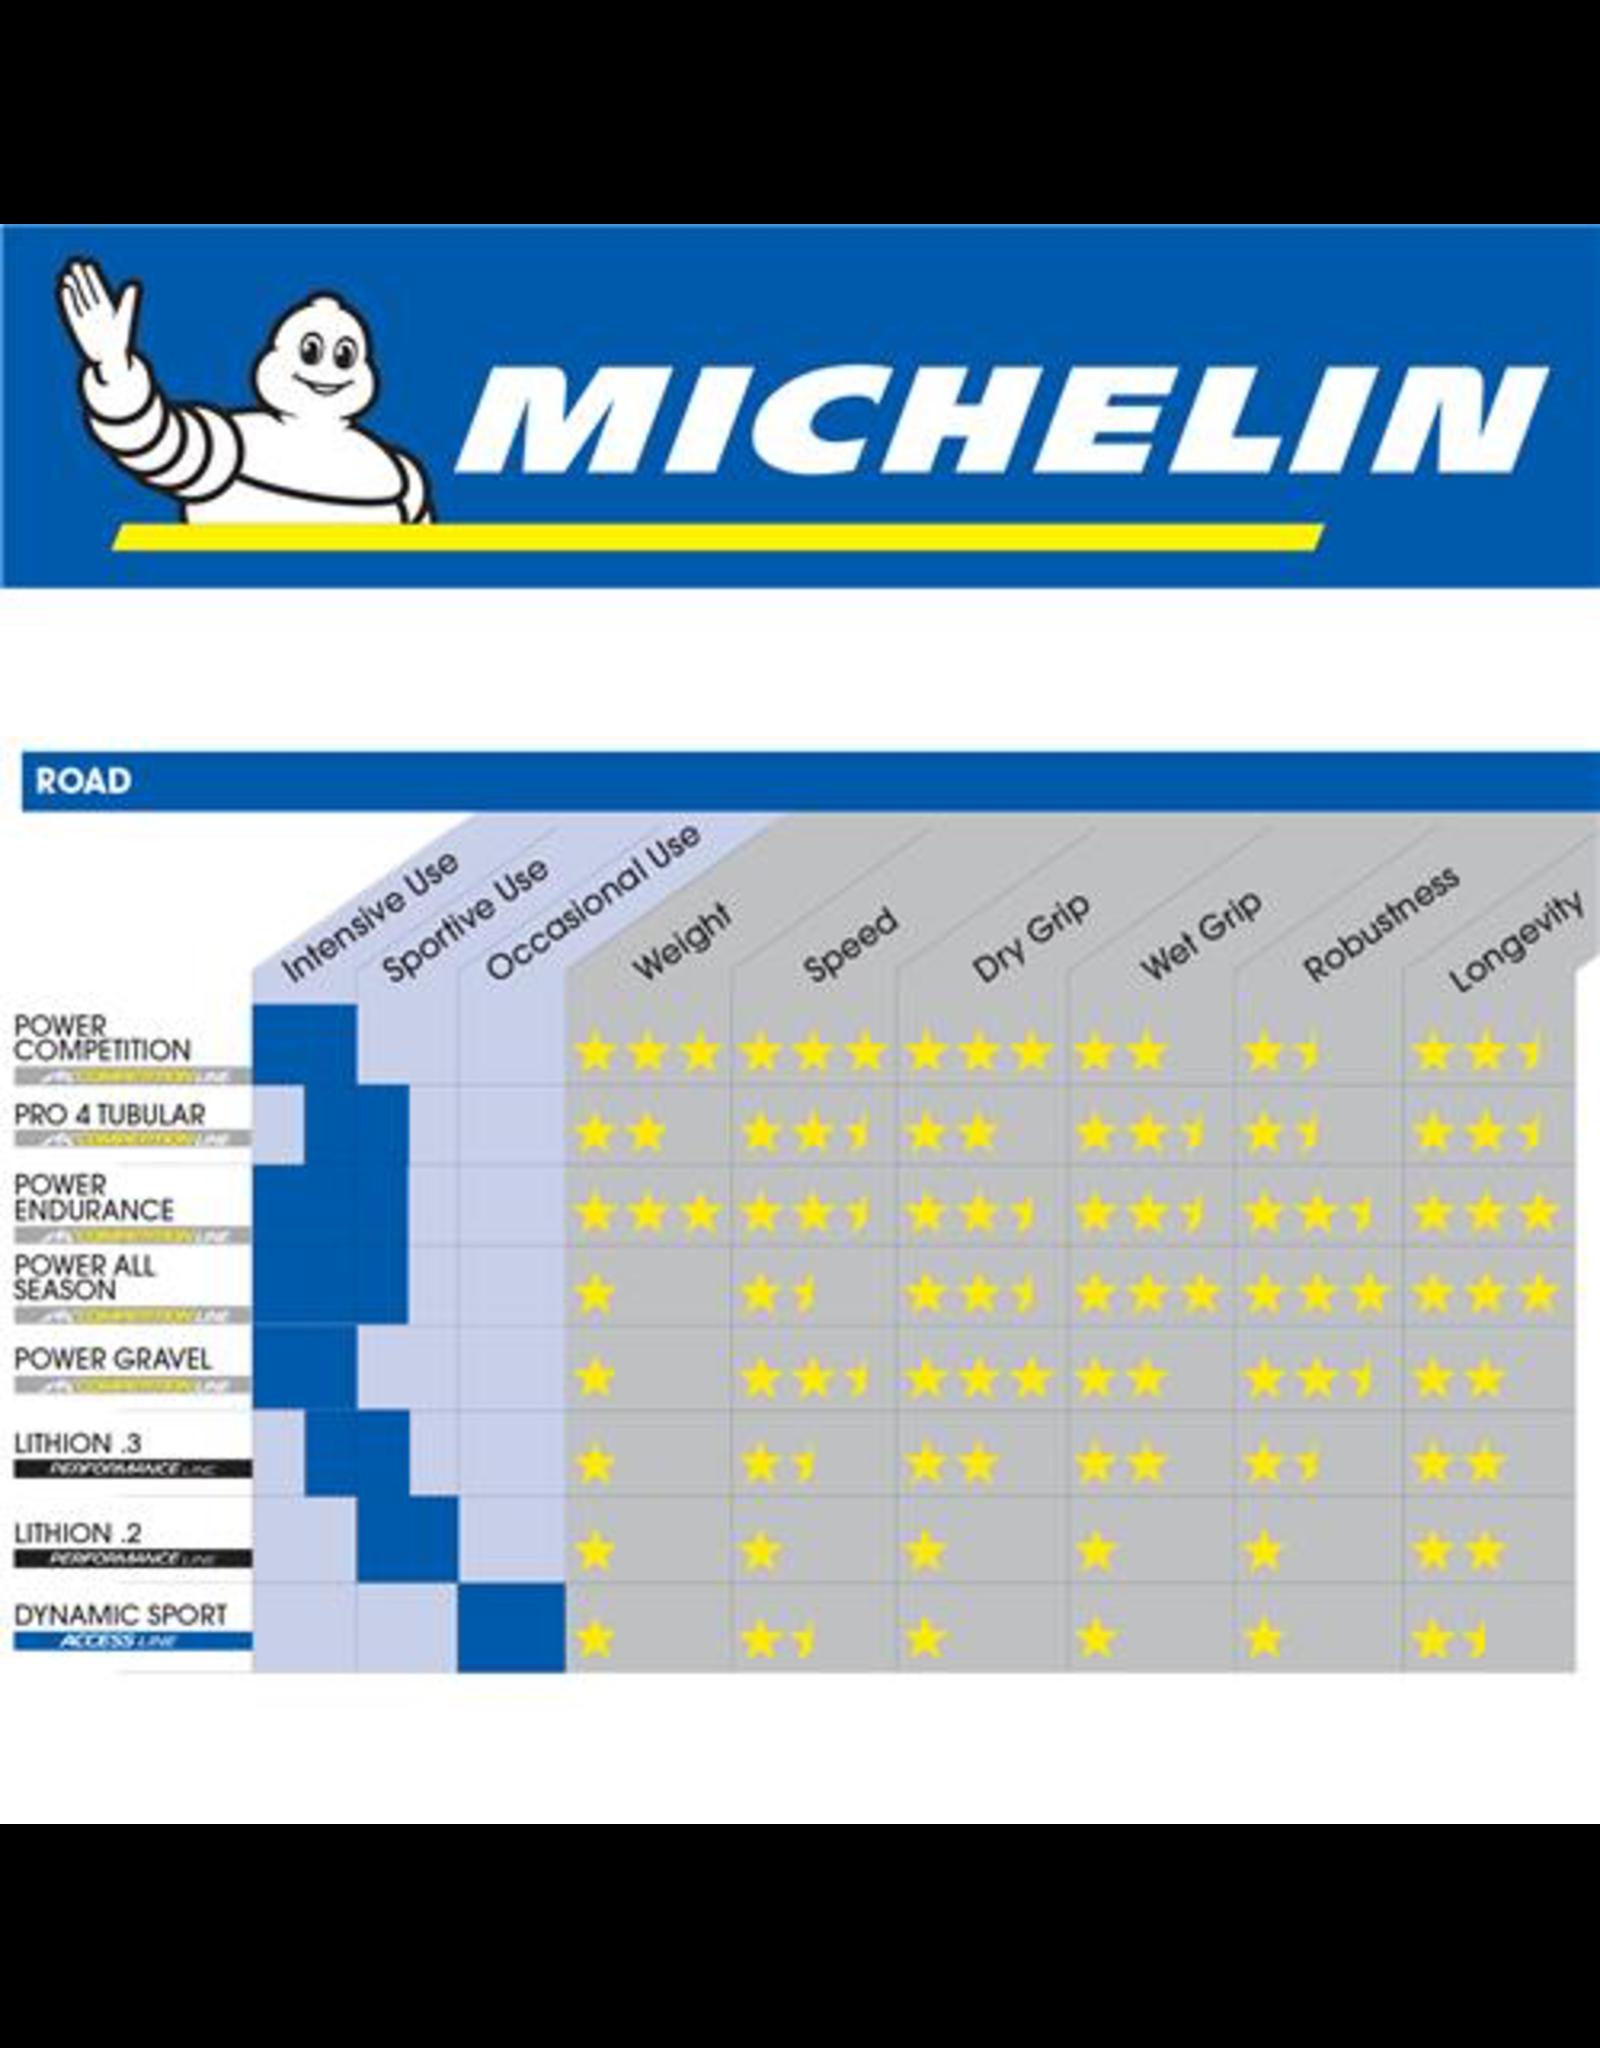 MICHELIN TYRE MICHELIN POWER ALL SEASON COMPETITION SPORT 700 x 25C